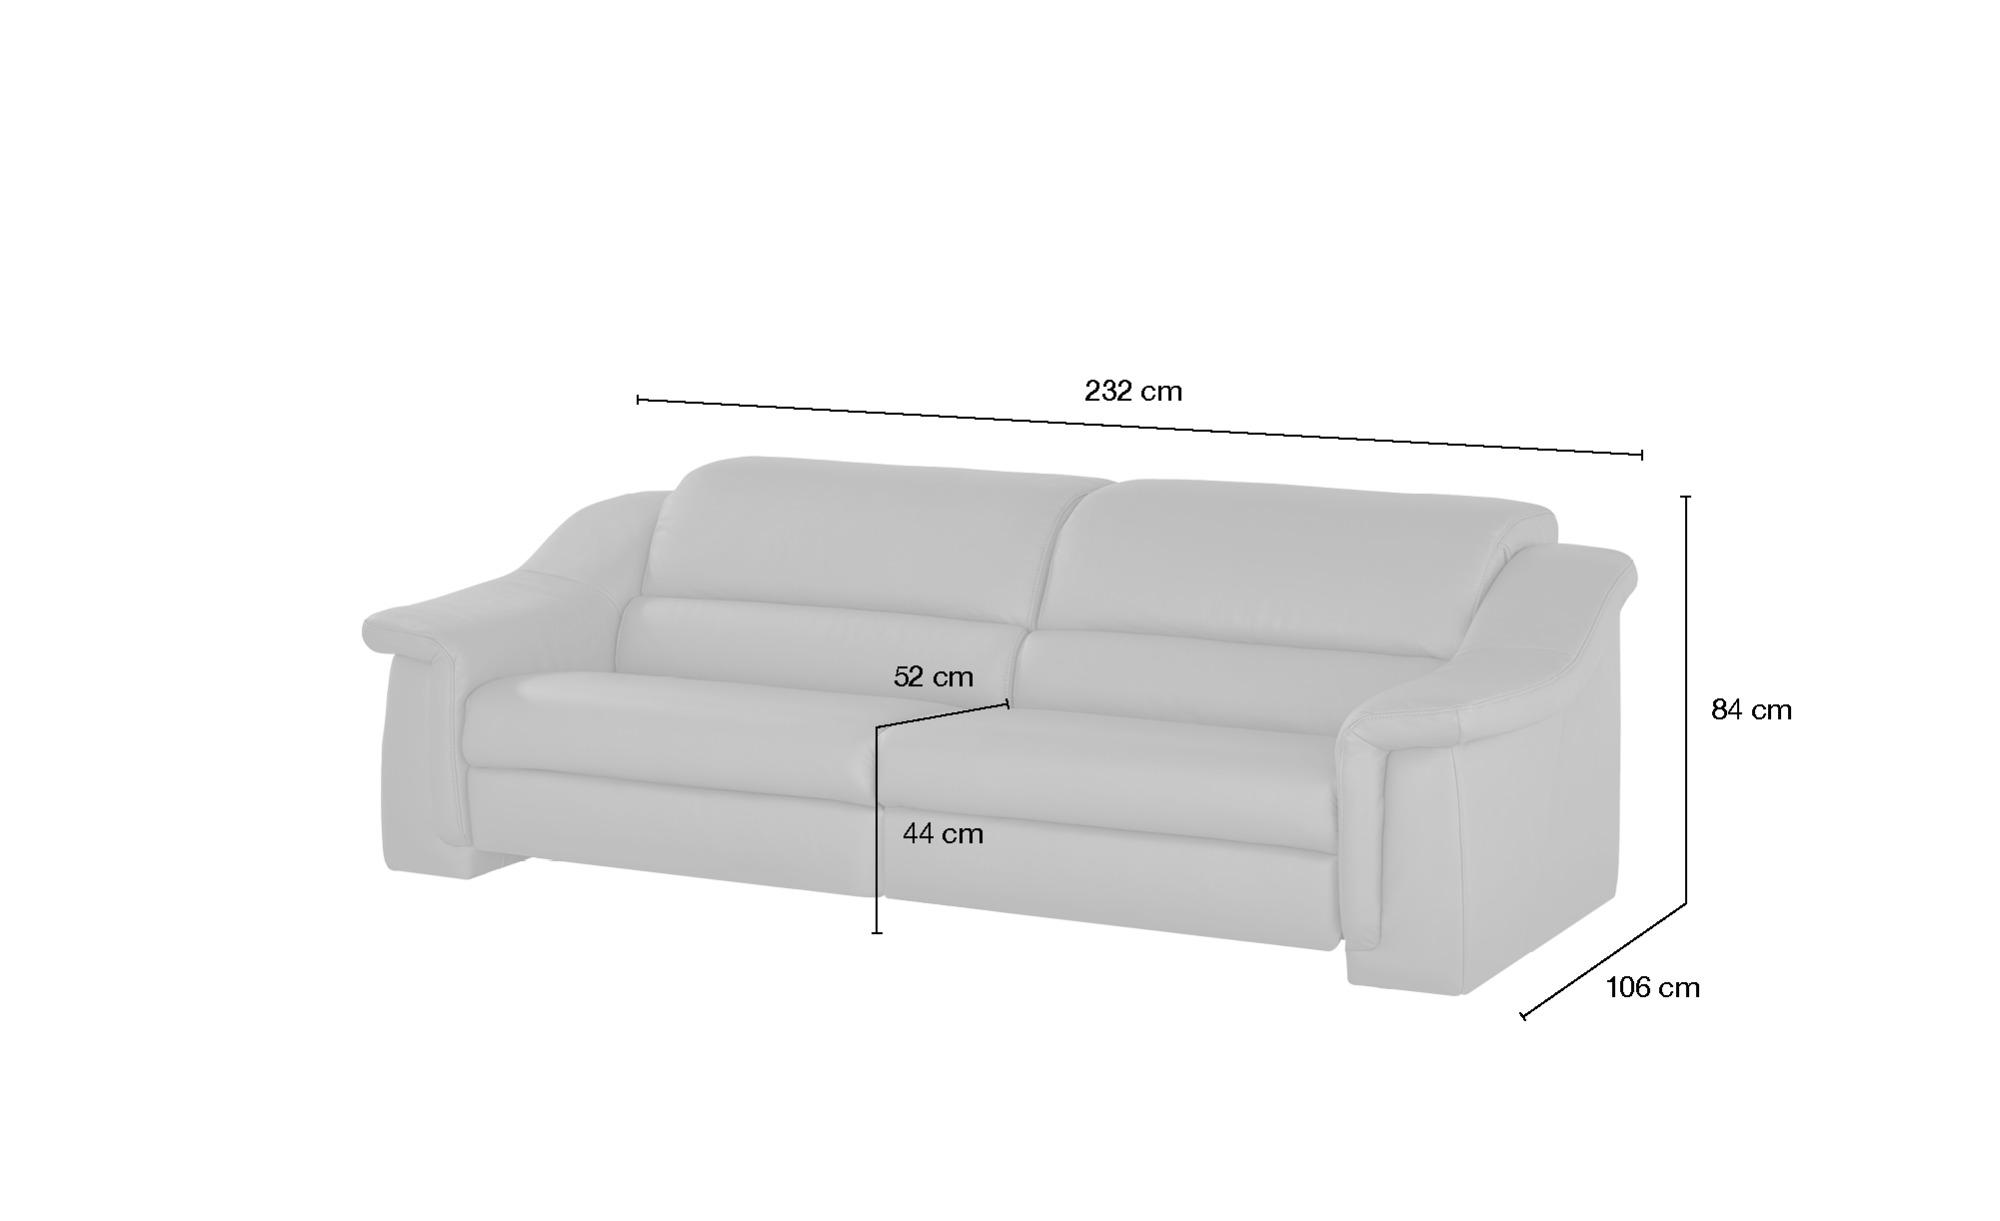 himolla Ledersofa  1501 ¦ schwarz ¦ Maße (cm): B: 232 H: 84 T: 106 Polstermöbel > Sofas > 3-Sitzer - Höffner